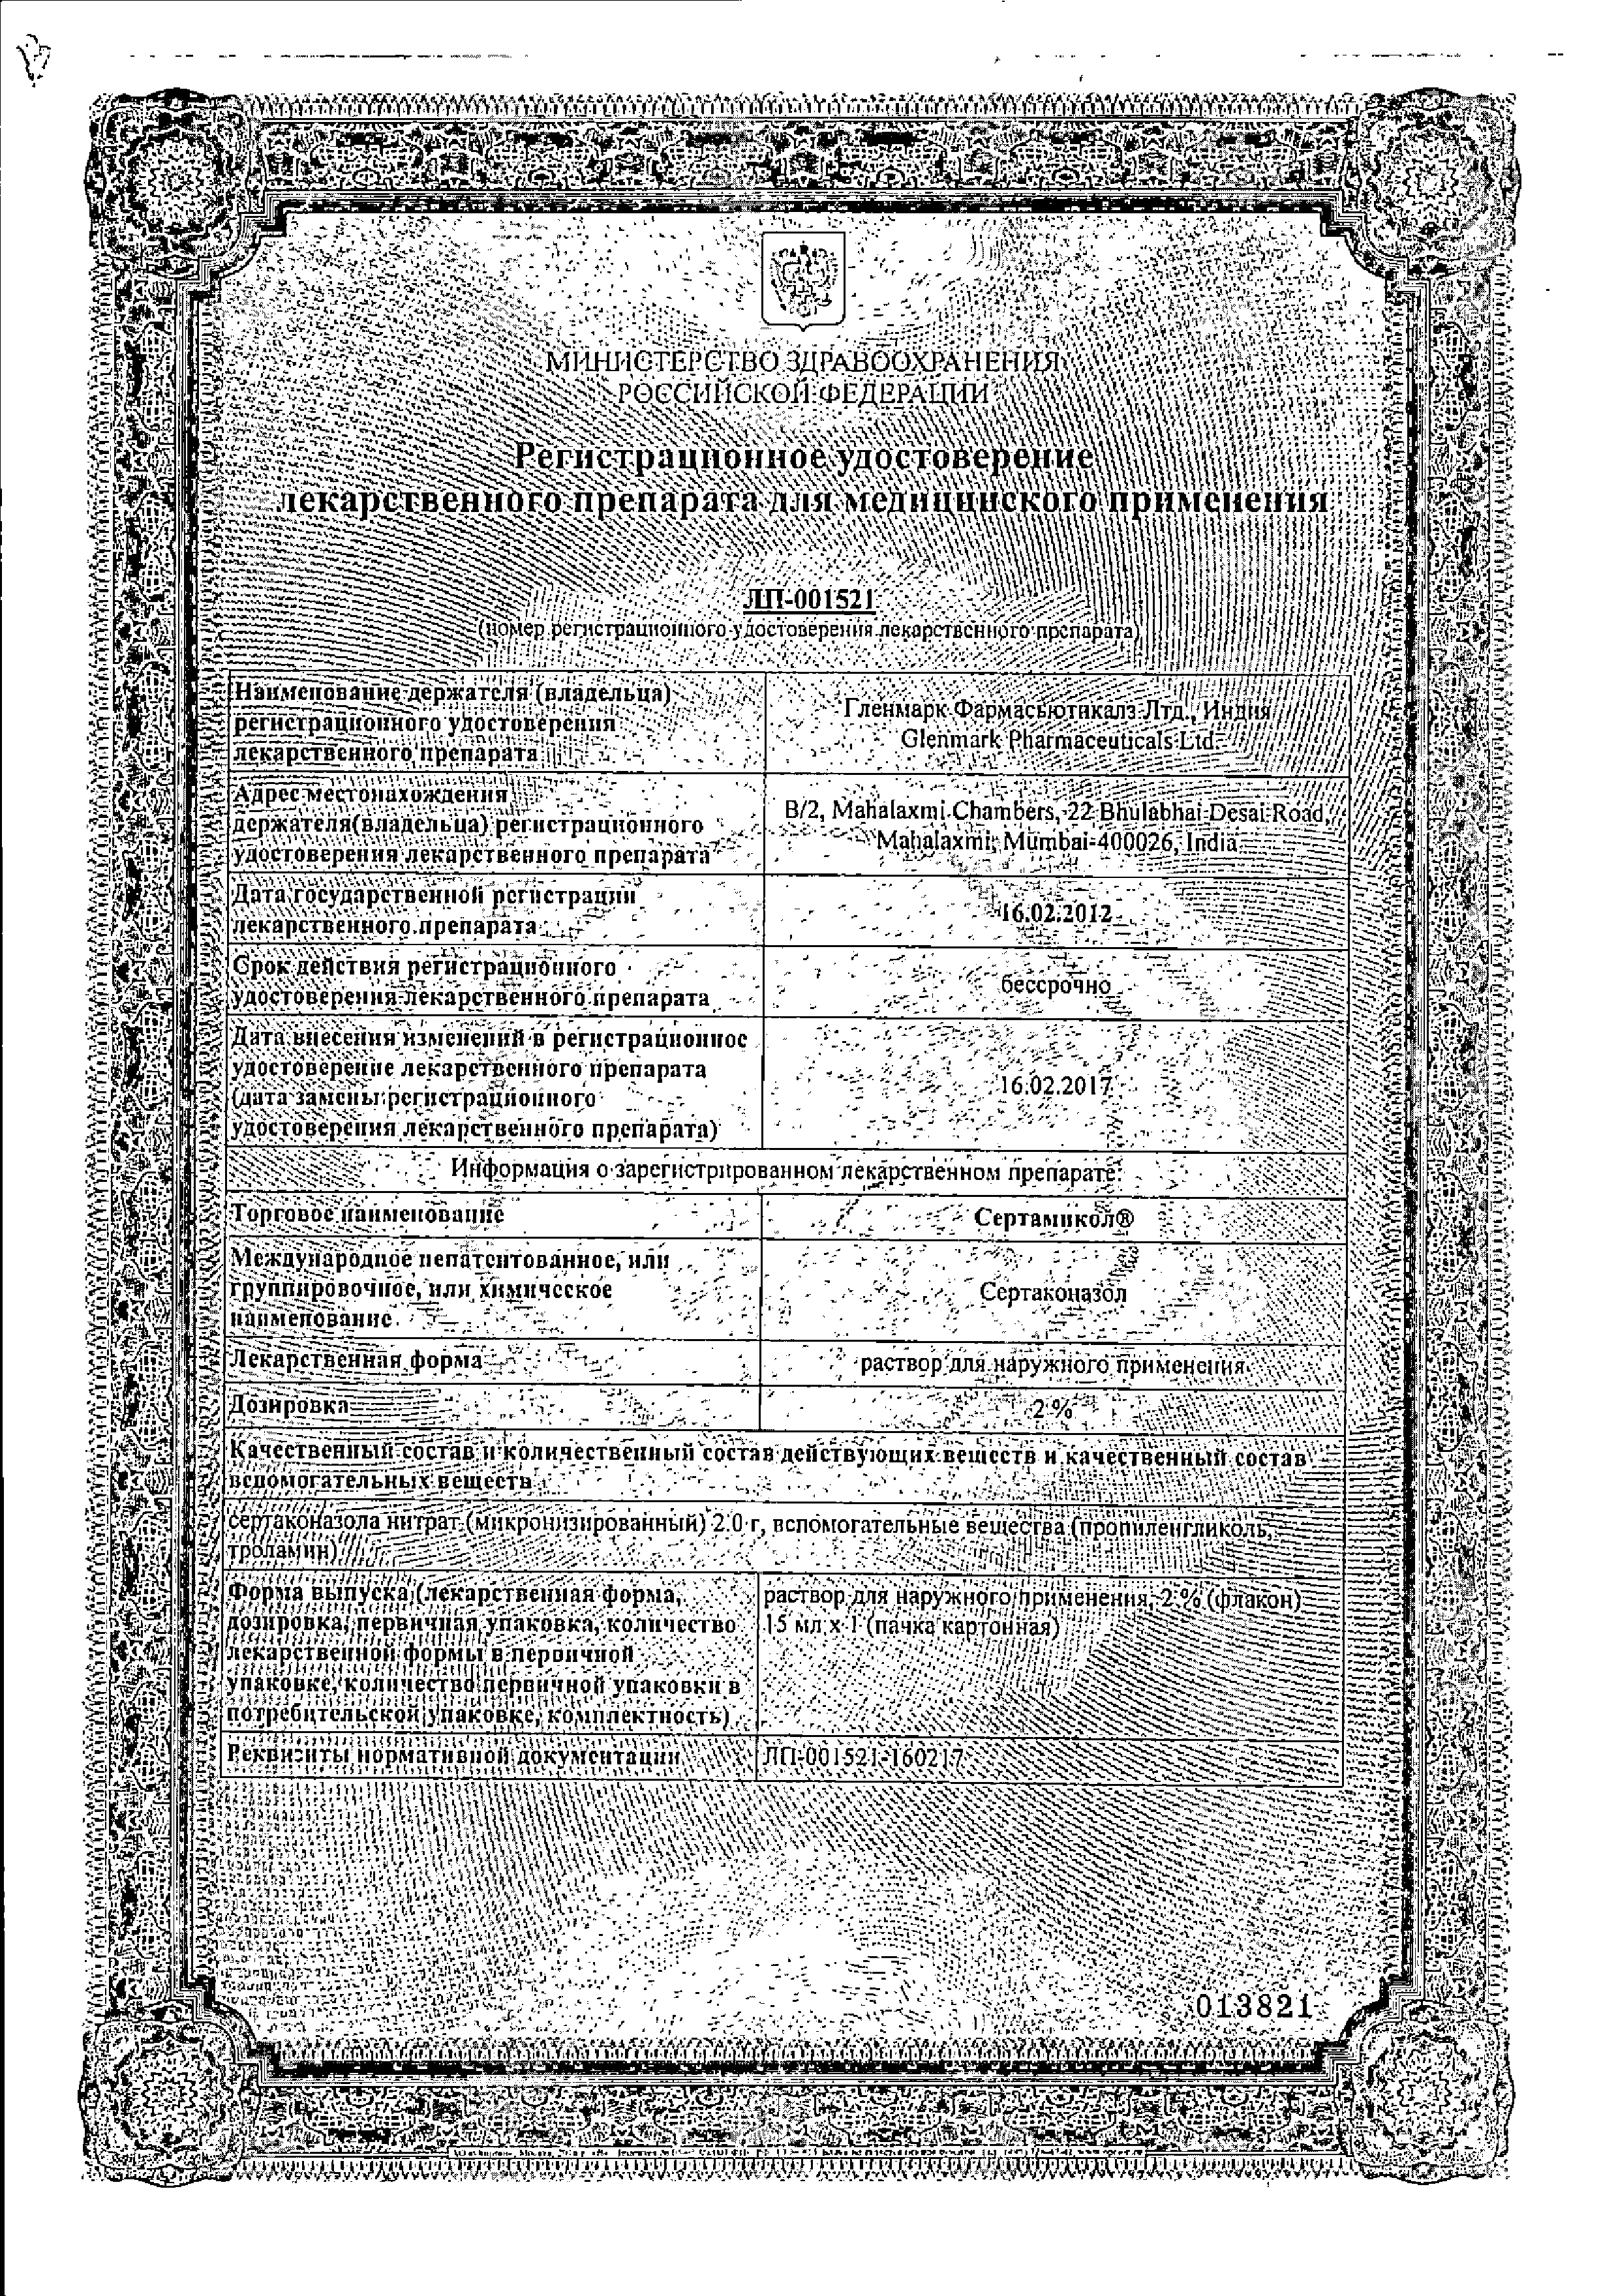 Офломикол сертификат